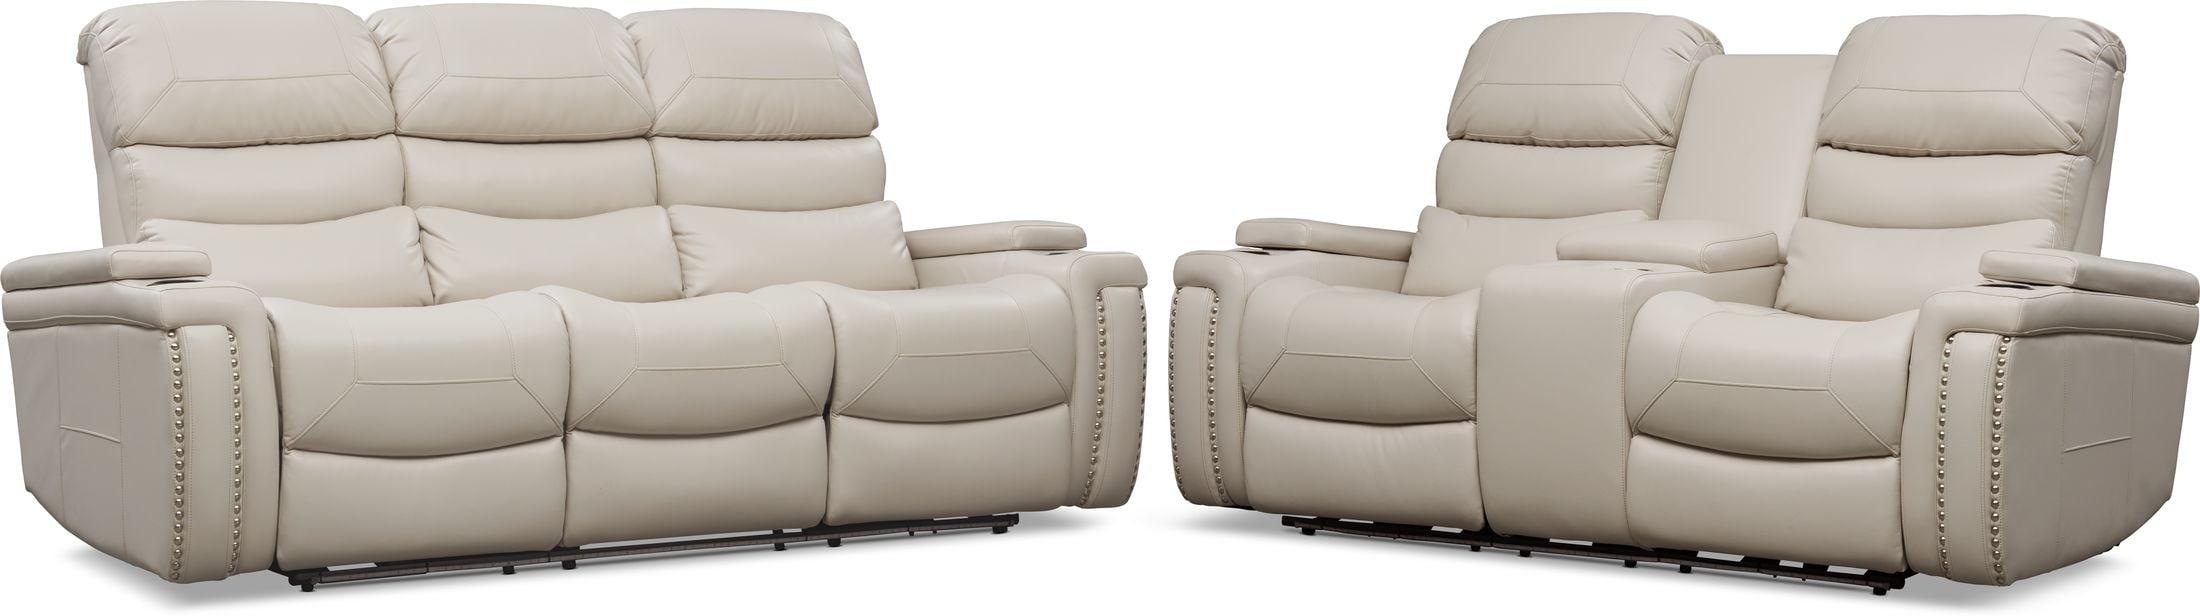 Living Room Furniture - Jackson Triple-Power Reclining Sofa and Loveseat Set